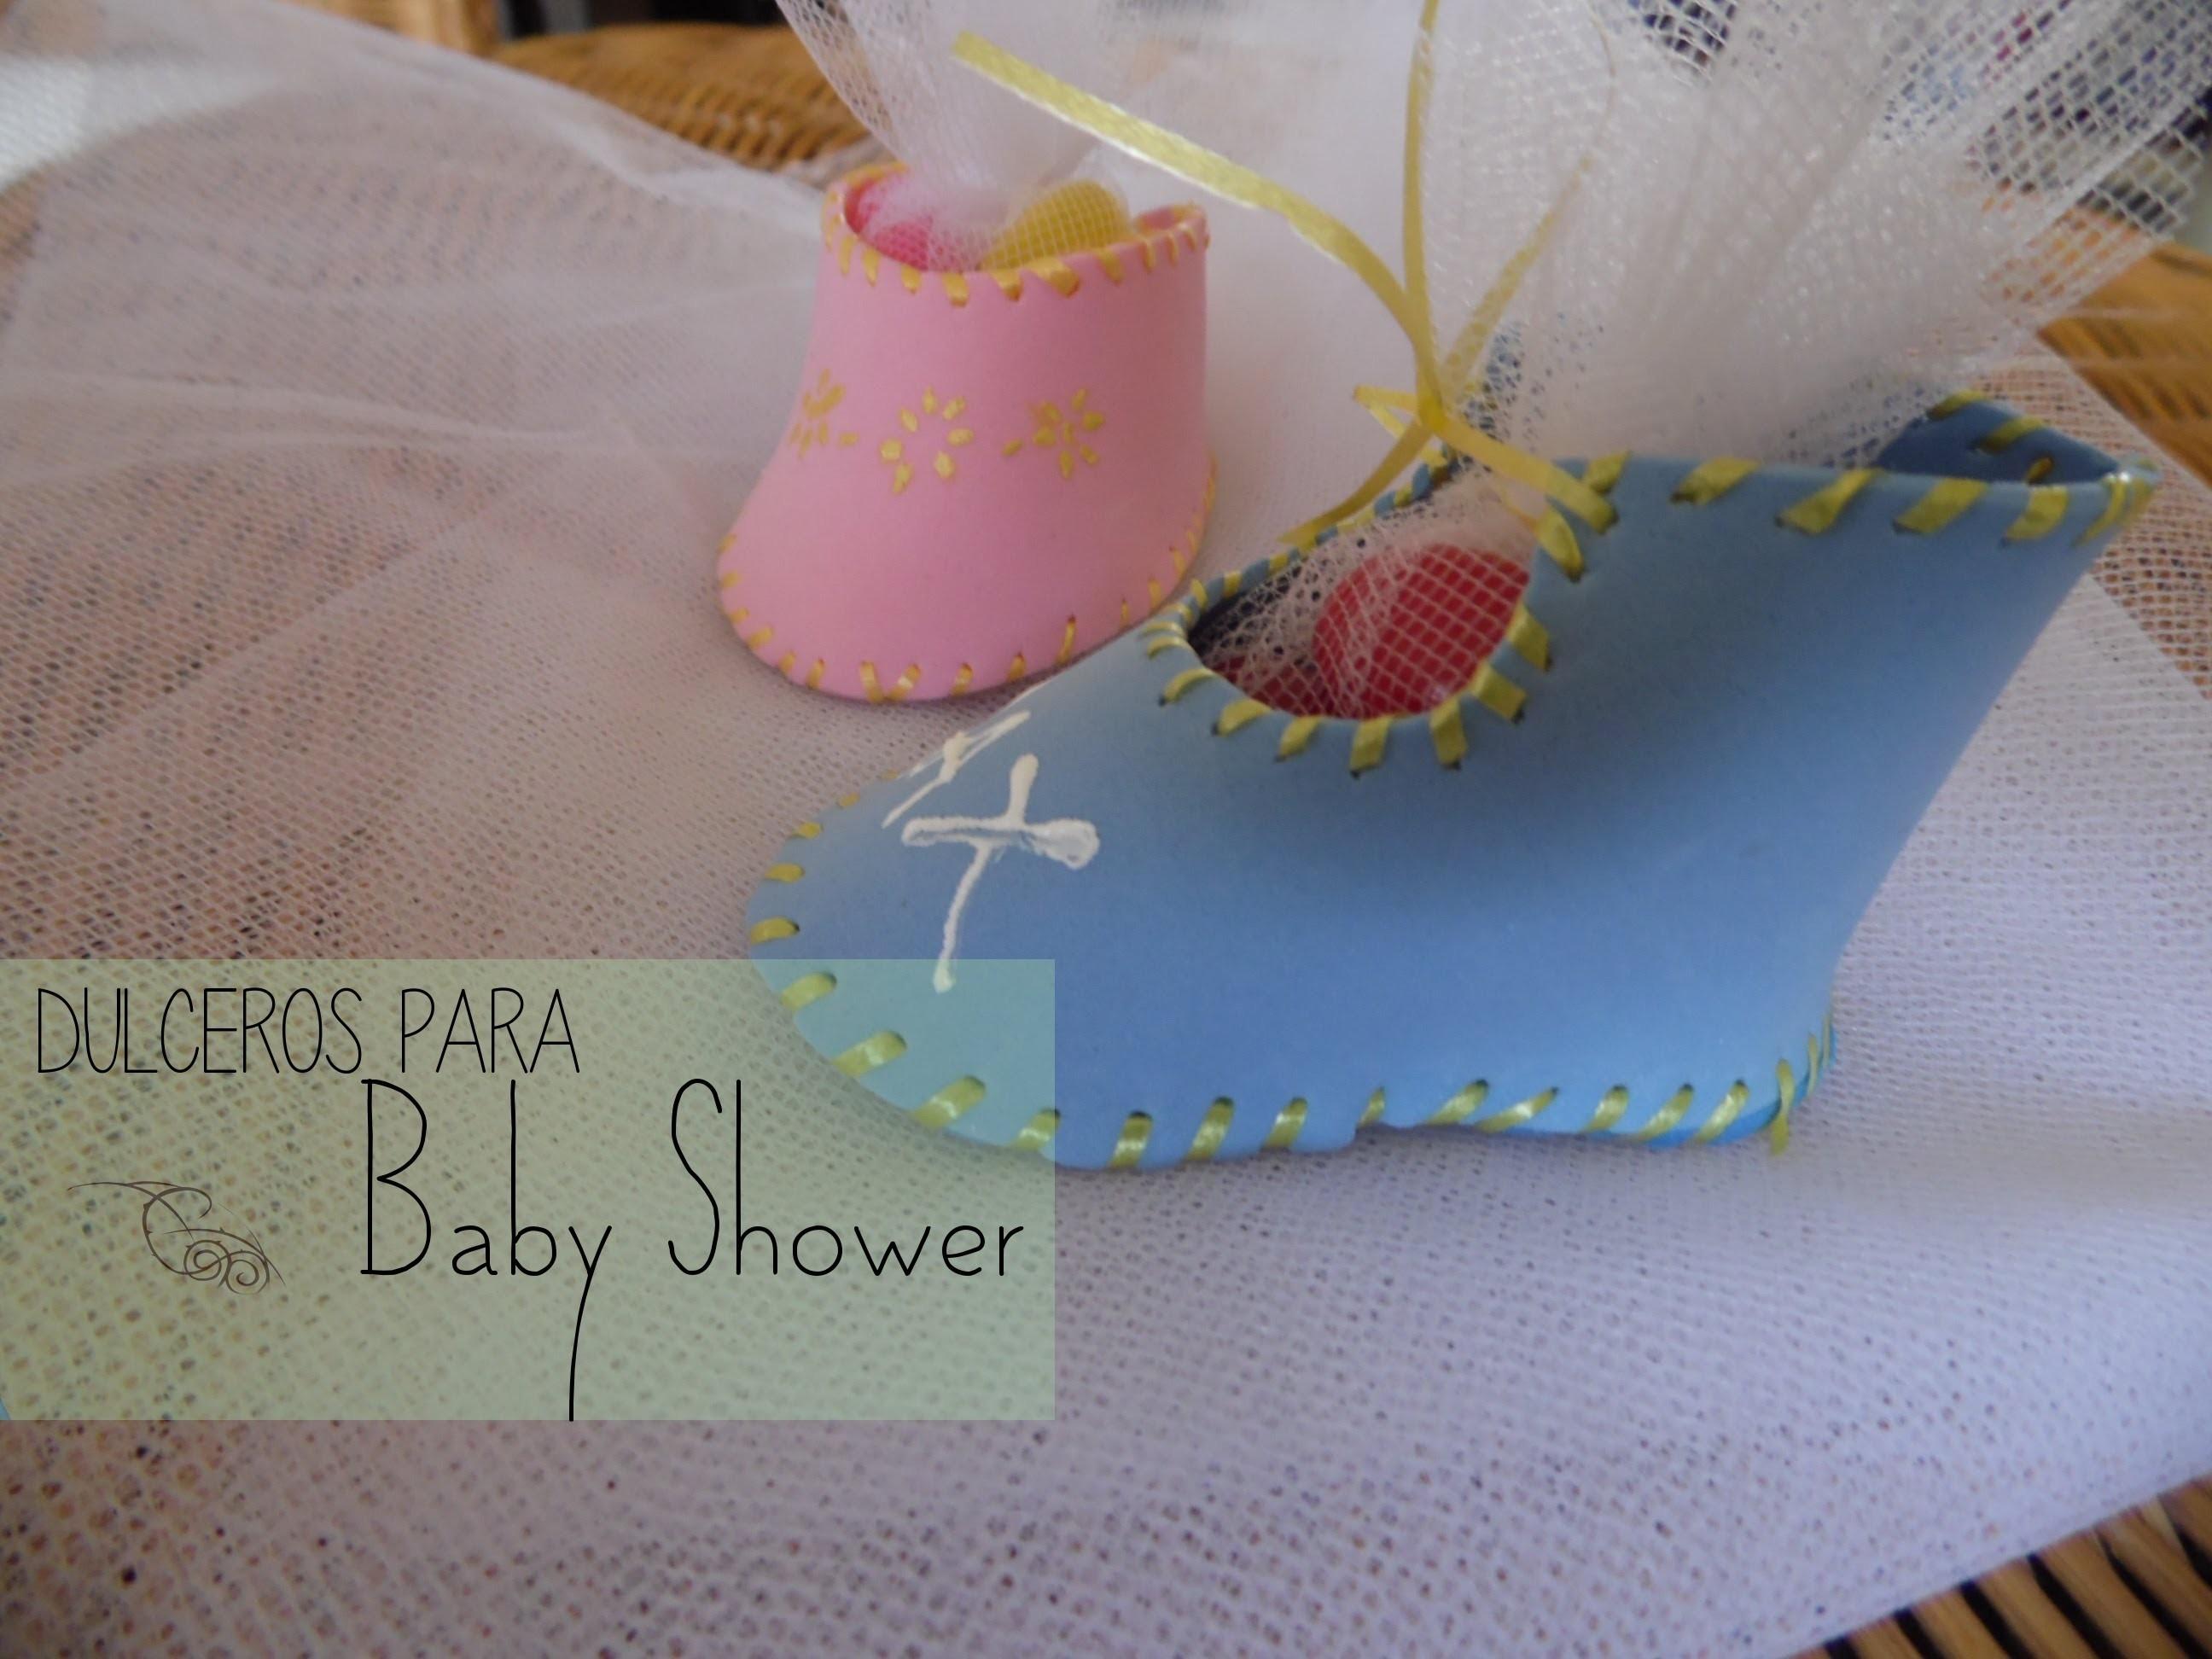 Dulcero para Baby Shower